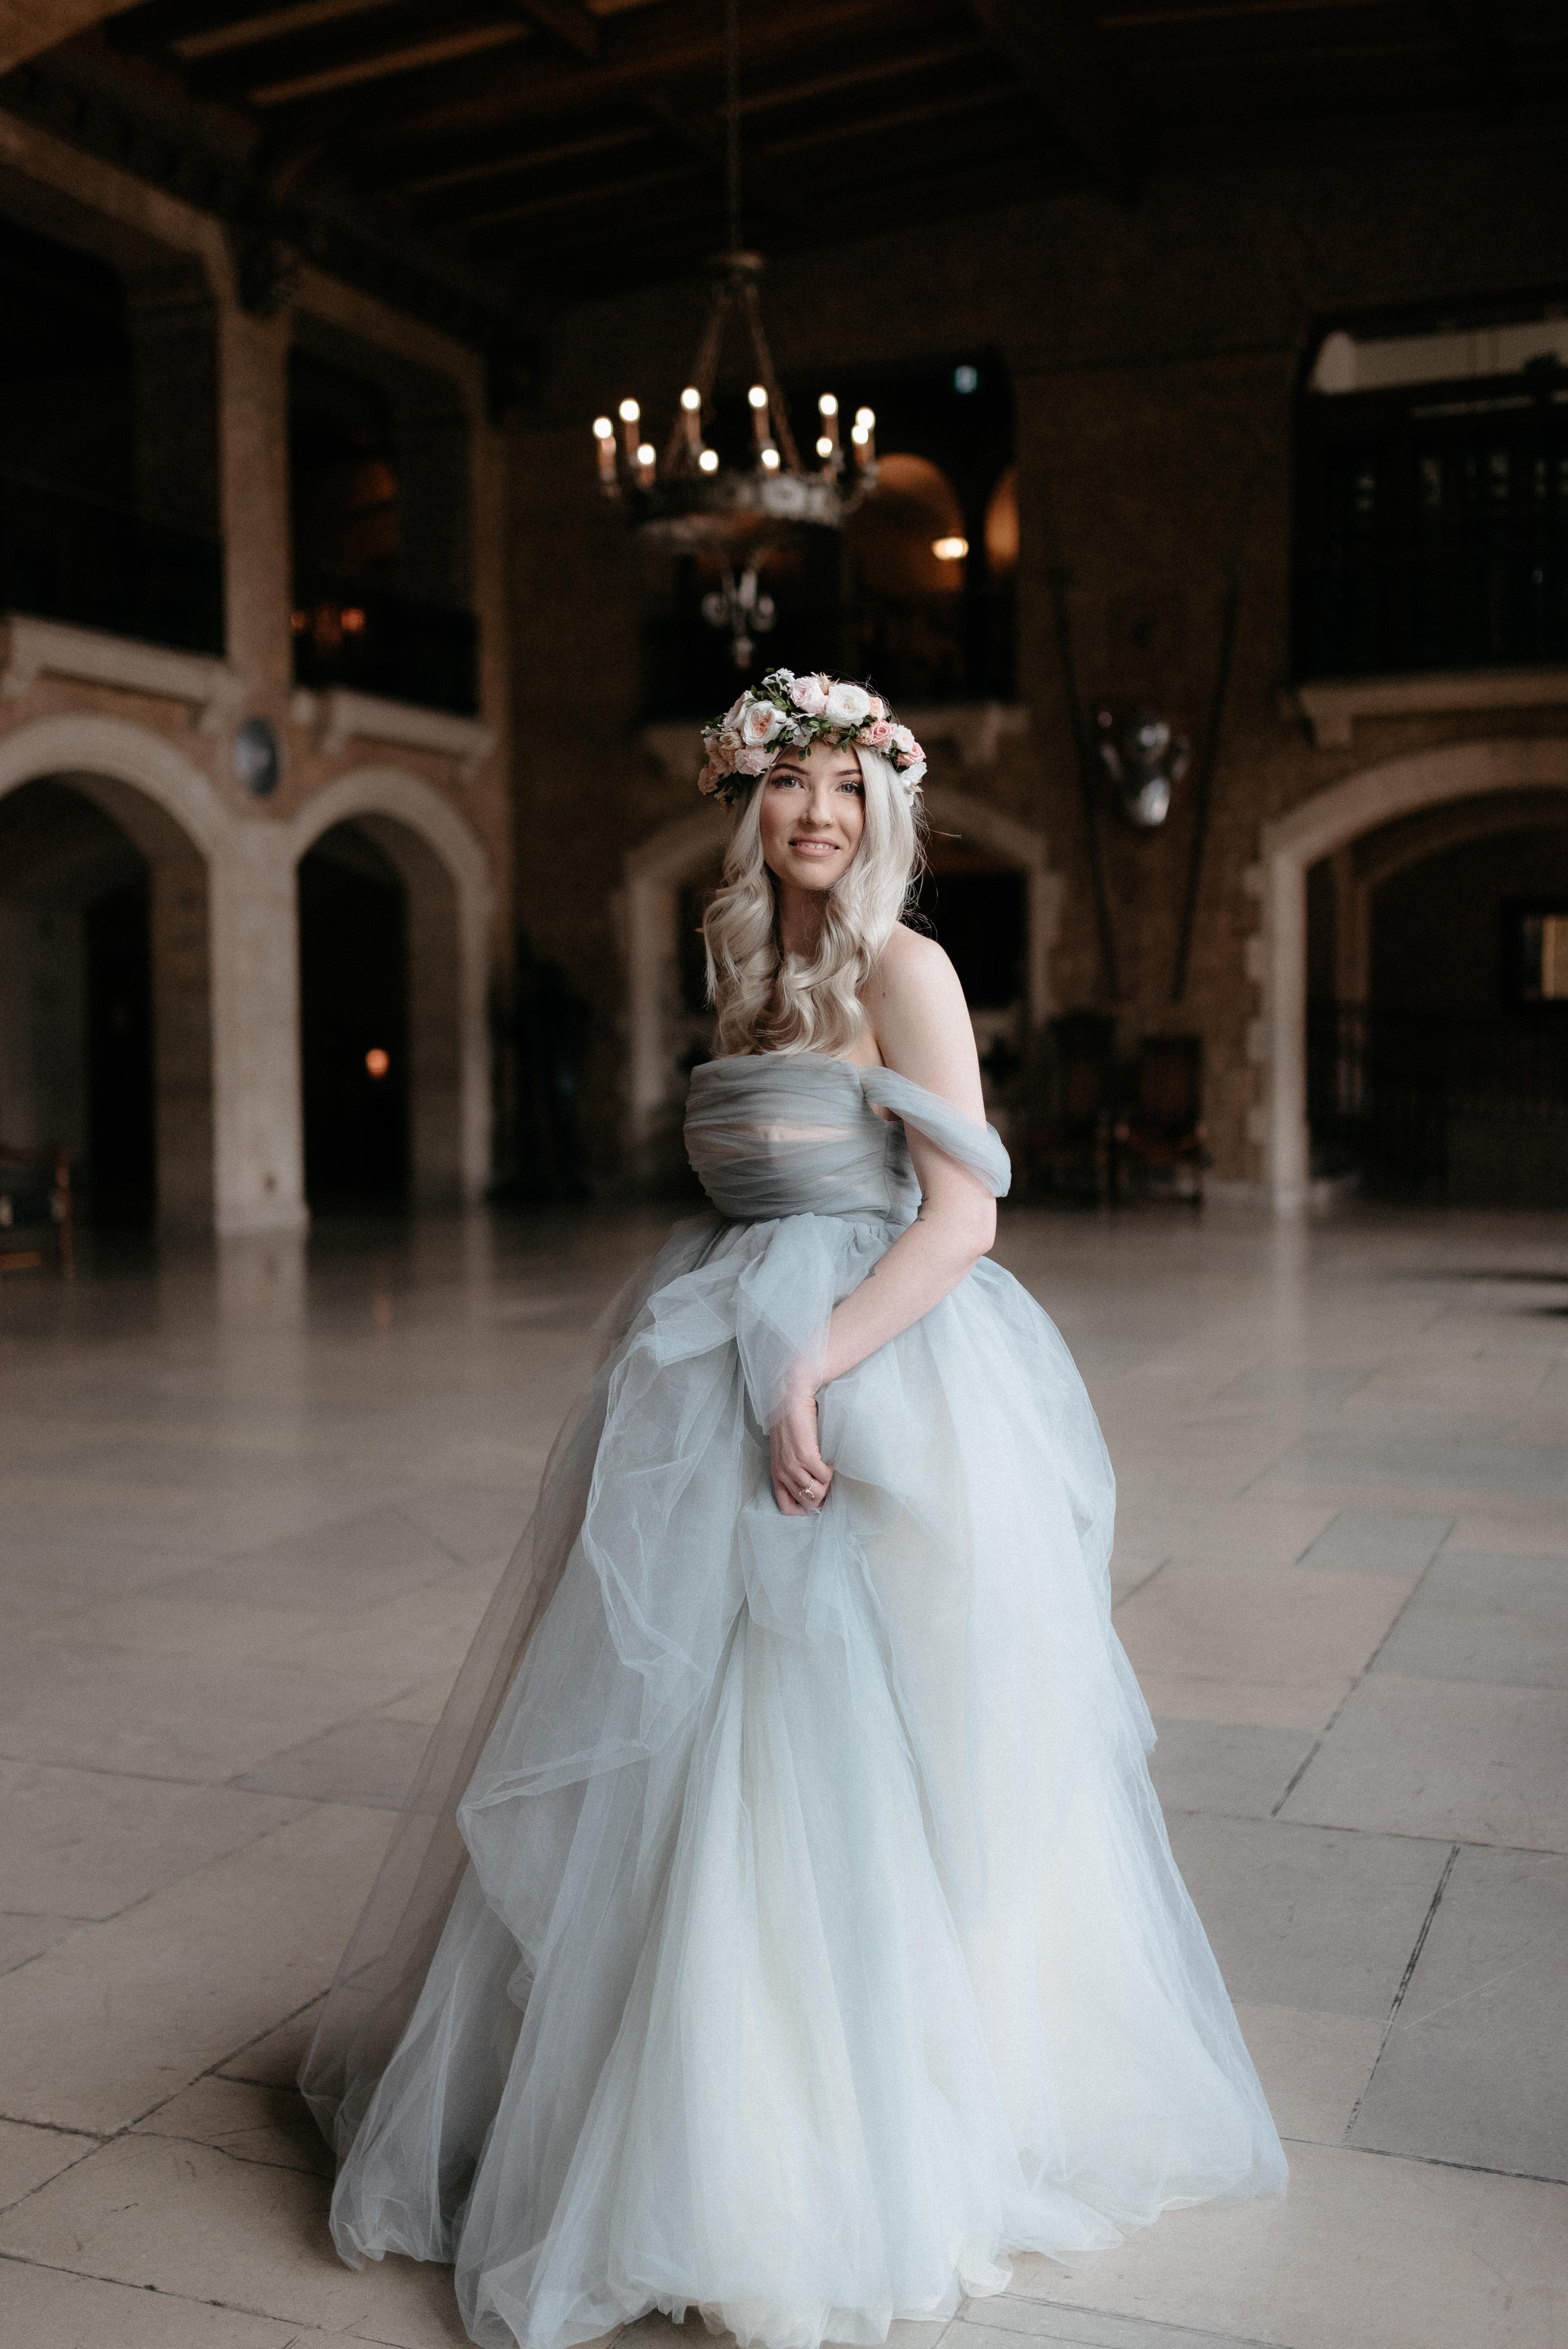 Tulle Wedding Dress - 0208 by Anna Skoblikova